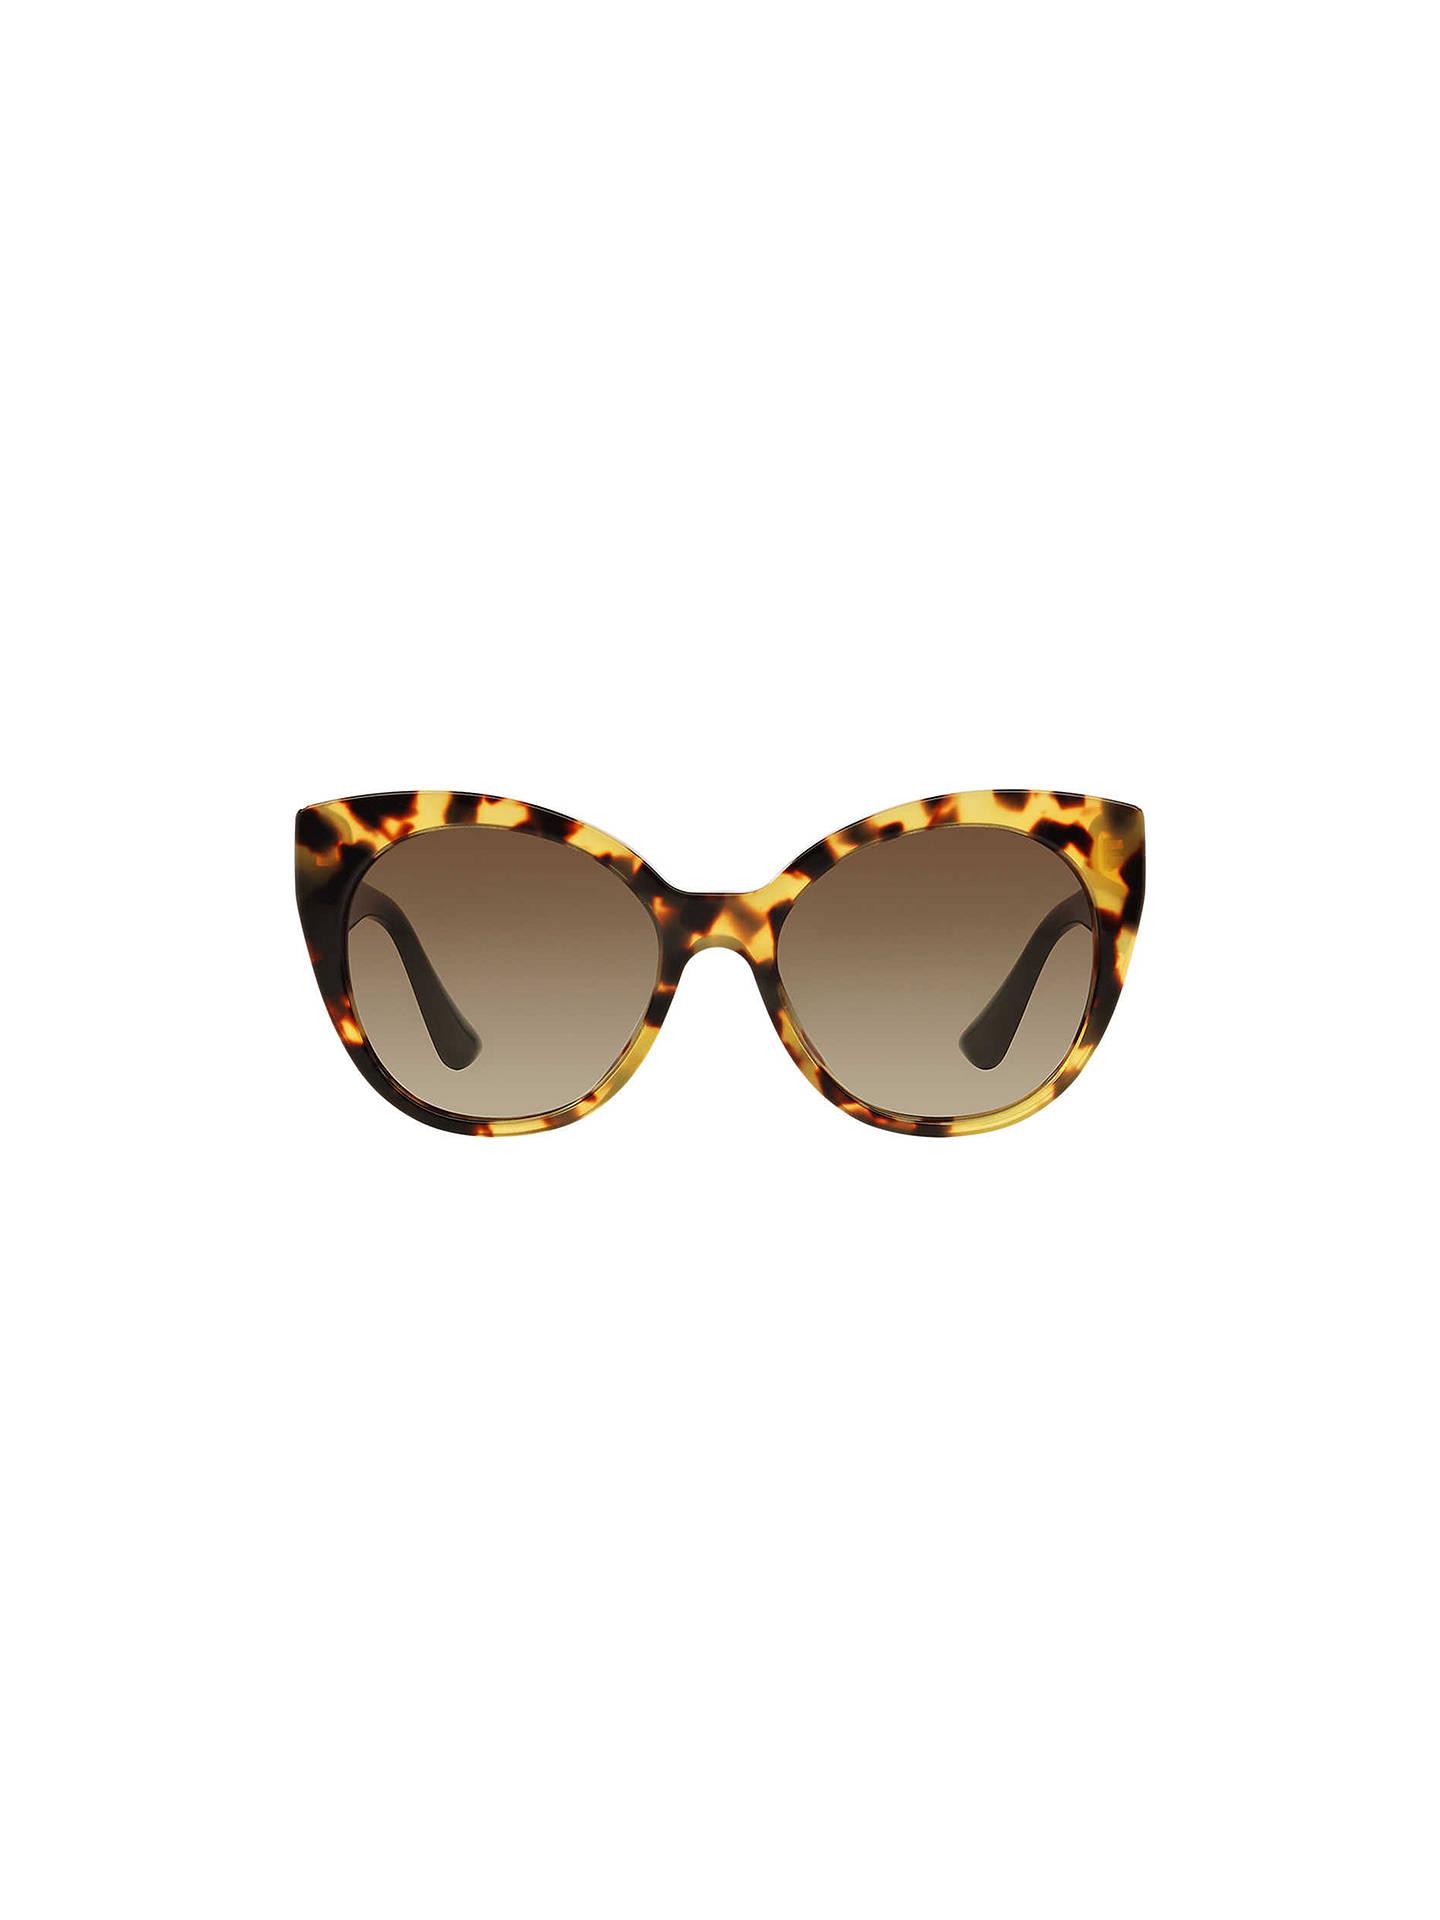 f9565fb13aa8 Miu Miu MU07RS Embellished Cat s Eye Sunglasses at John Lewis   Partners